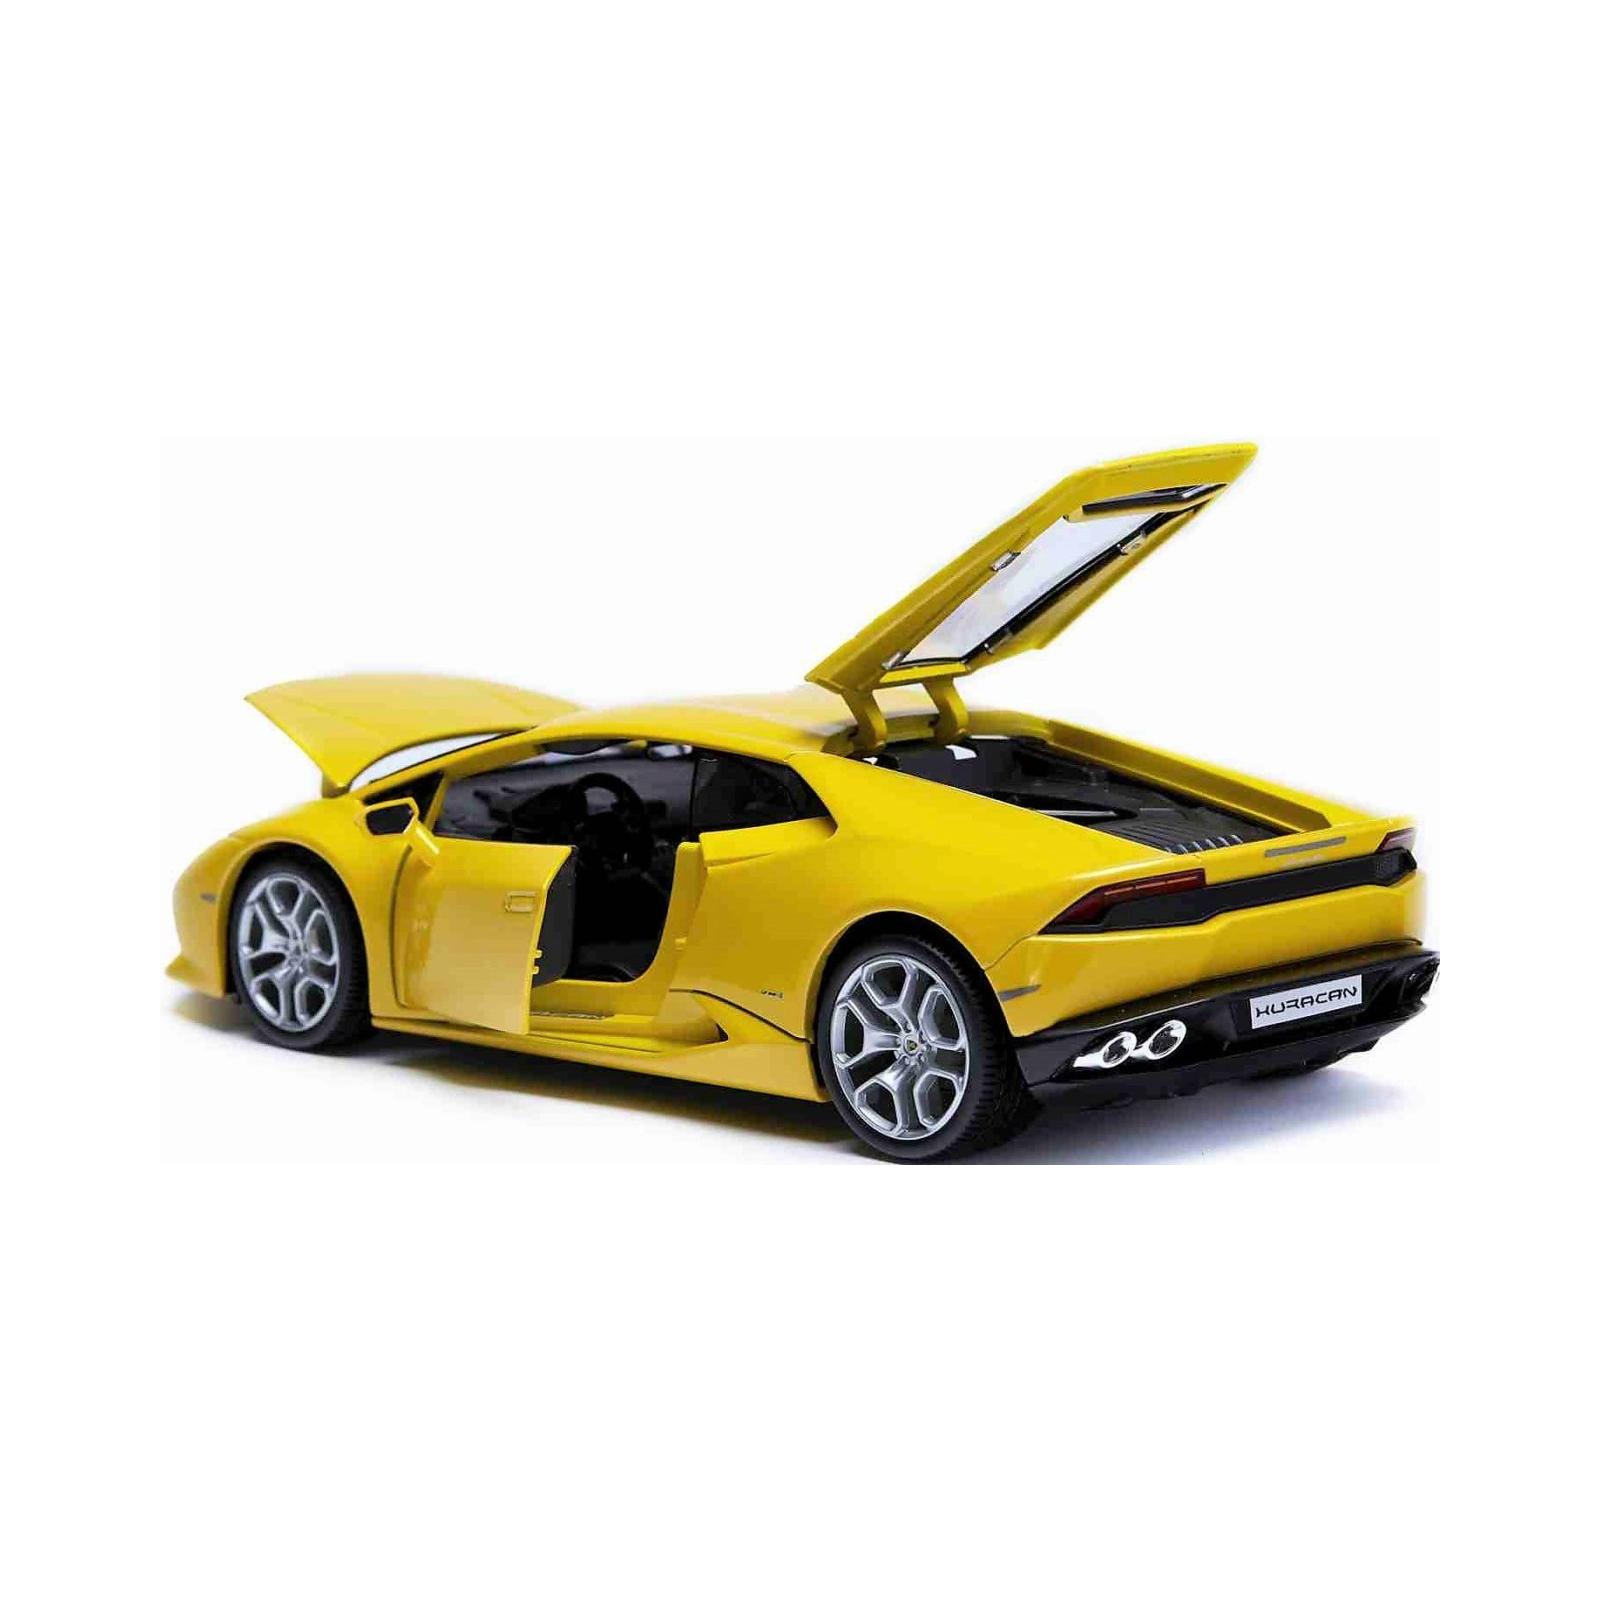 Машина Maisto Lamborghini Huracan LP 610-4 (1:24) желтый (31509 yellow) изображение 2